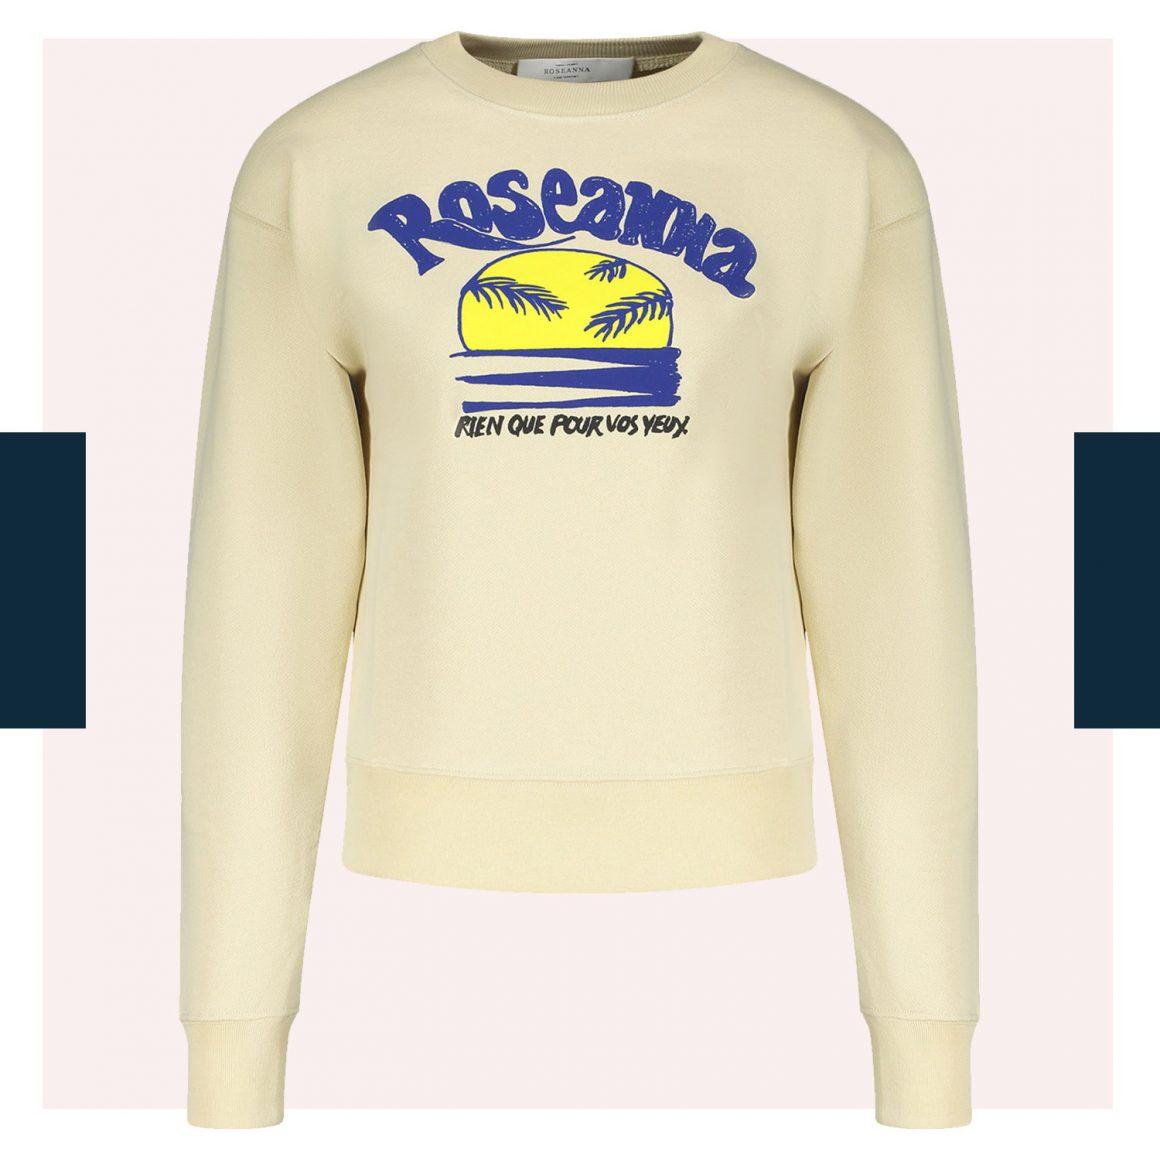 Le sweat-shirt Louis Sunset de Roseanna (coloris vanille)